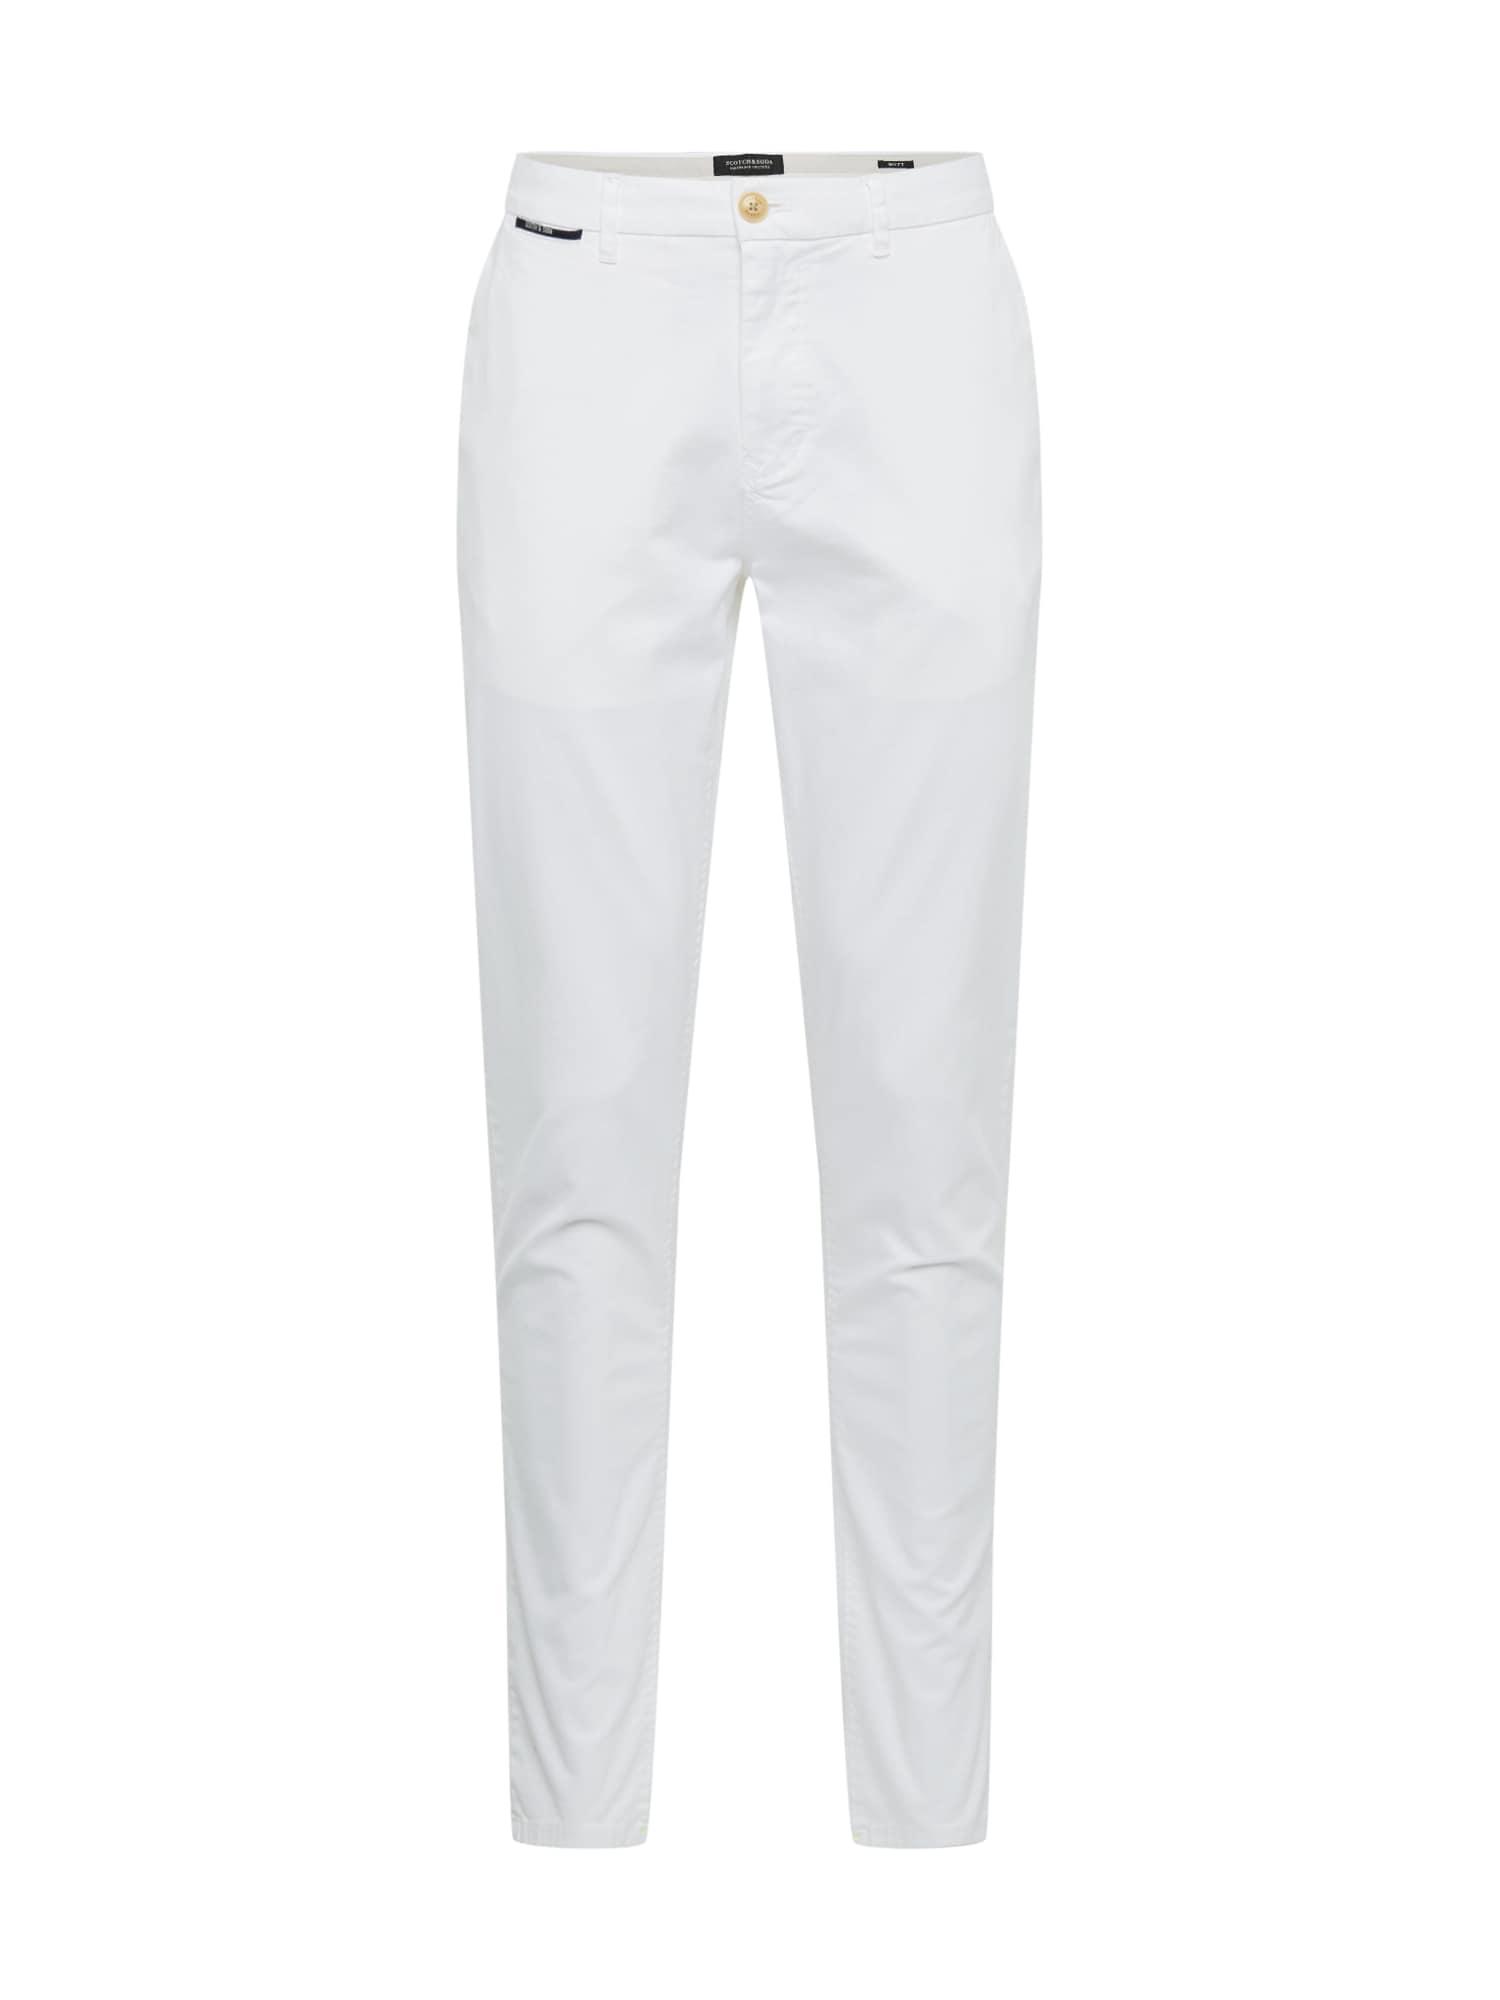 SCOTCH & SODA Chino kalhoty 'Mott'  bílá